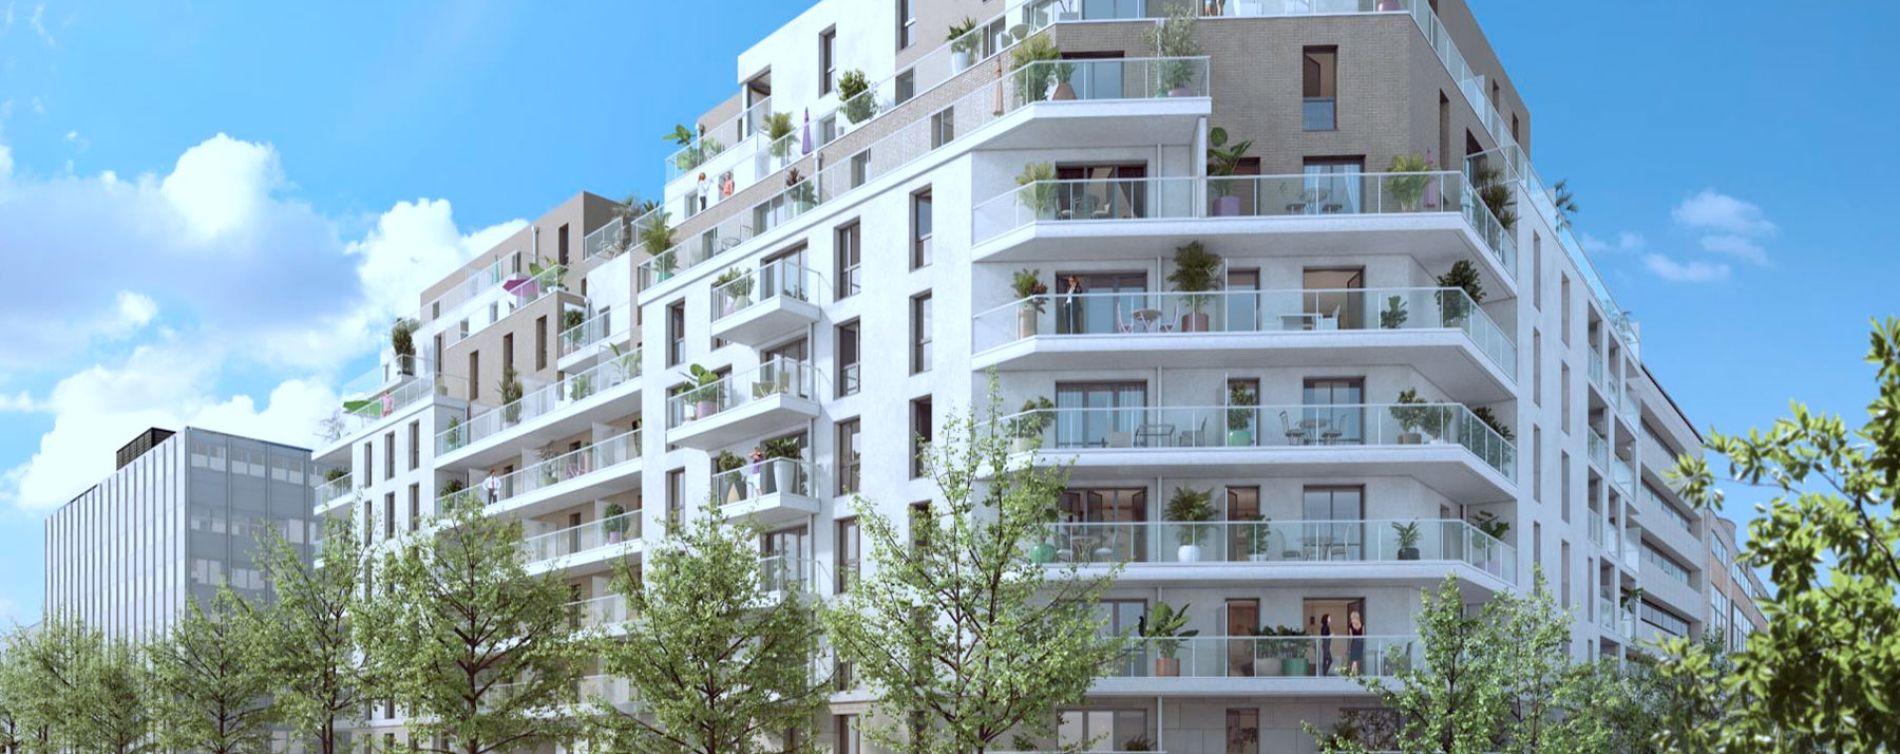 Rueil-Malmaison : programme immobilier neuve « 6 rue Paul Heroult » (4)